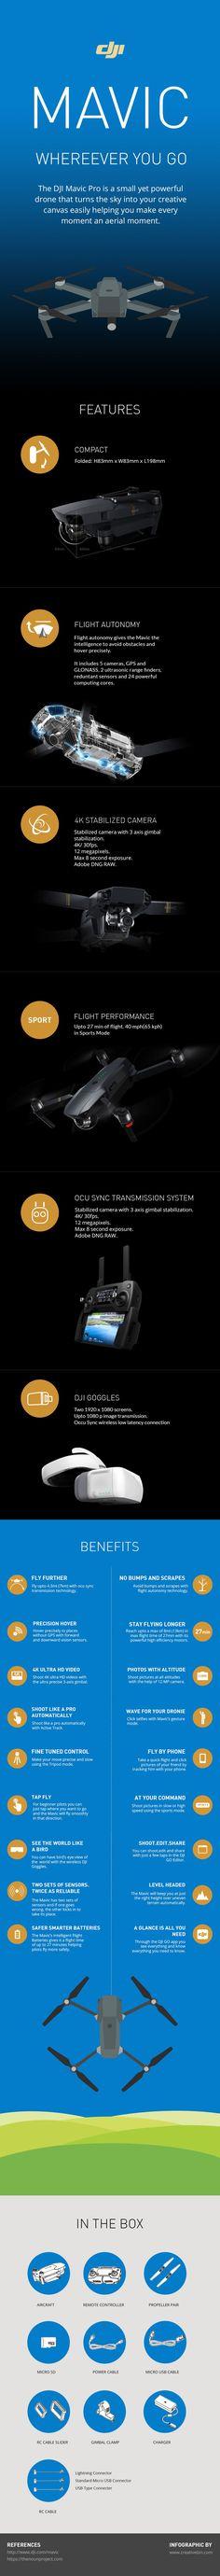 Infographic on Mavic Pro, DJI's latest drone.